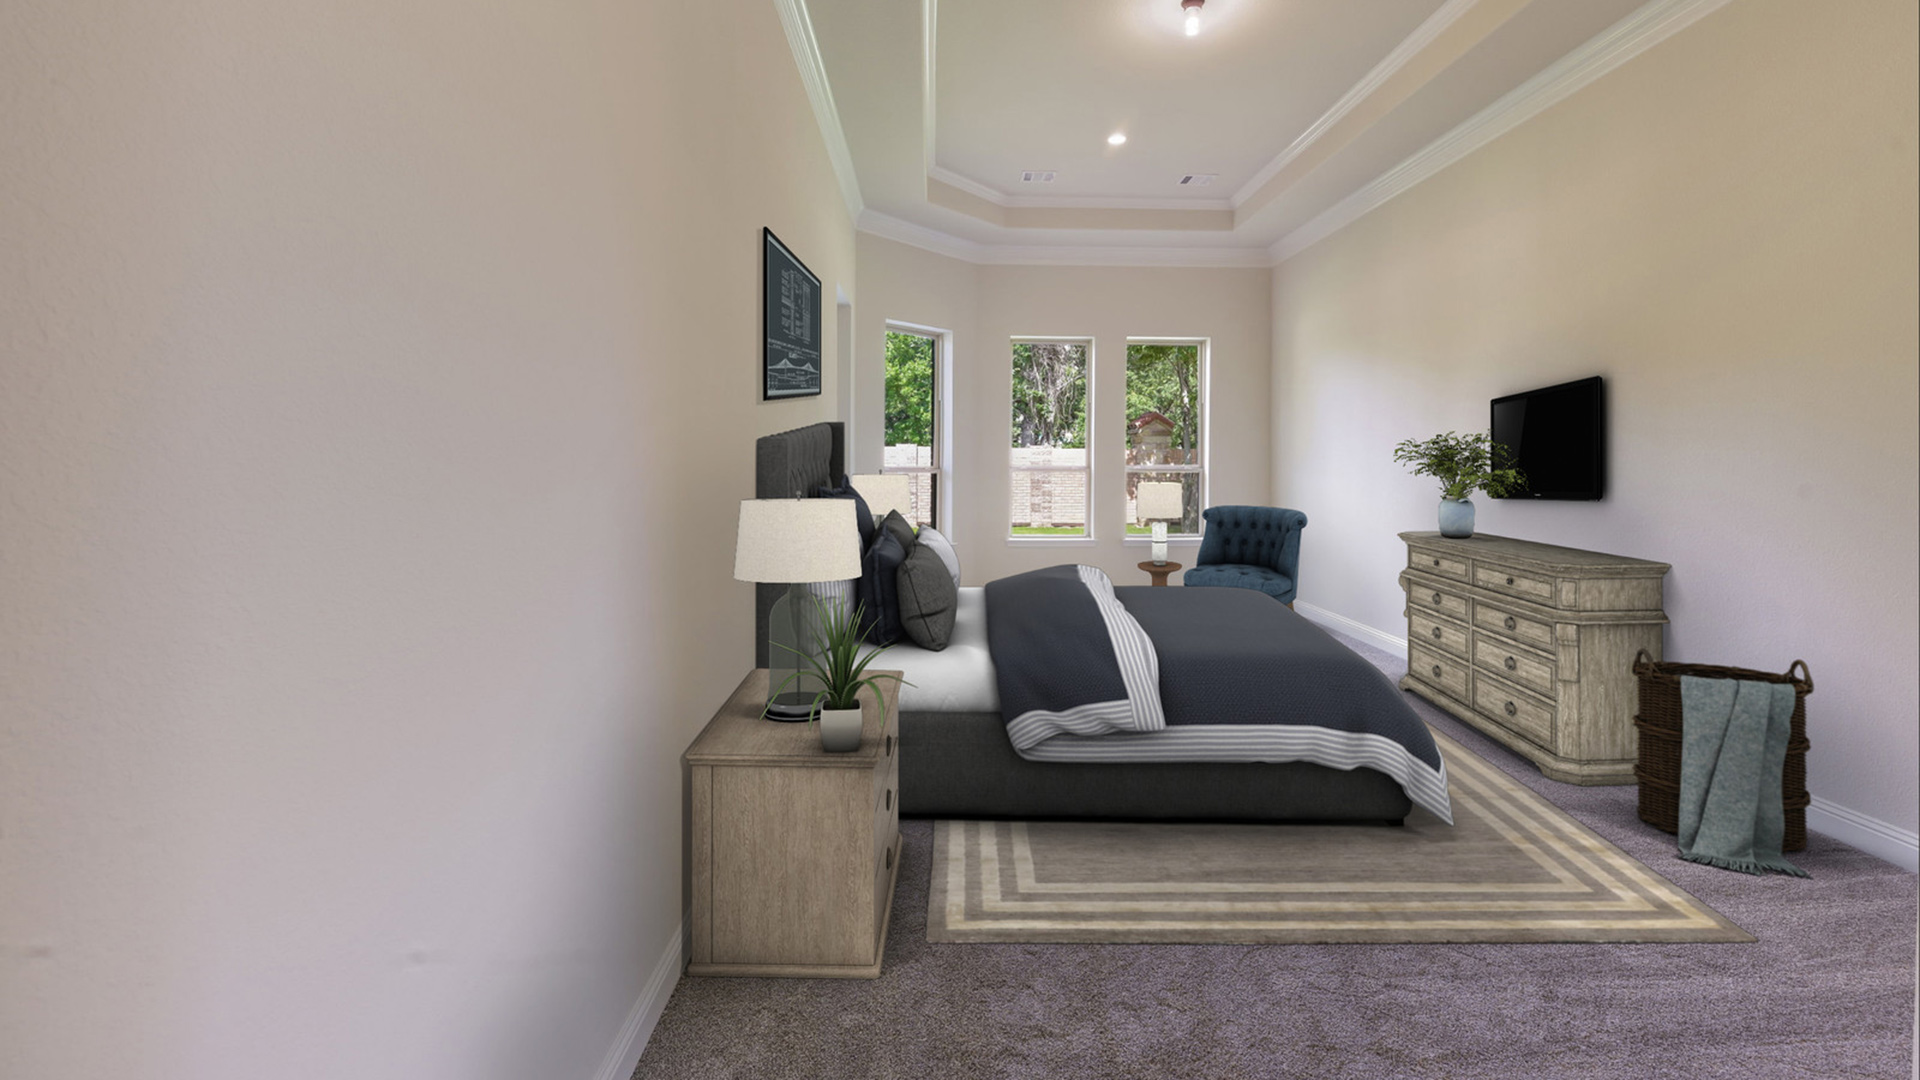 Stanton Stanton Home Design on cobb home design, garrison home design, tranquility home design,